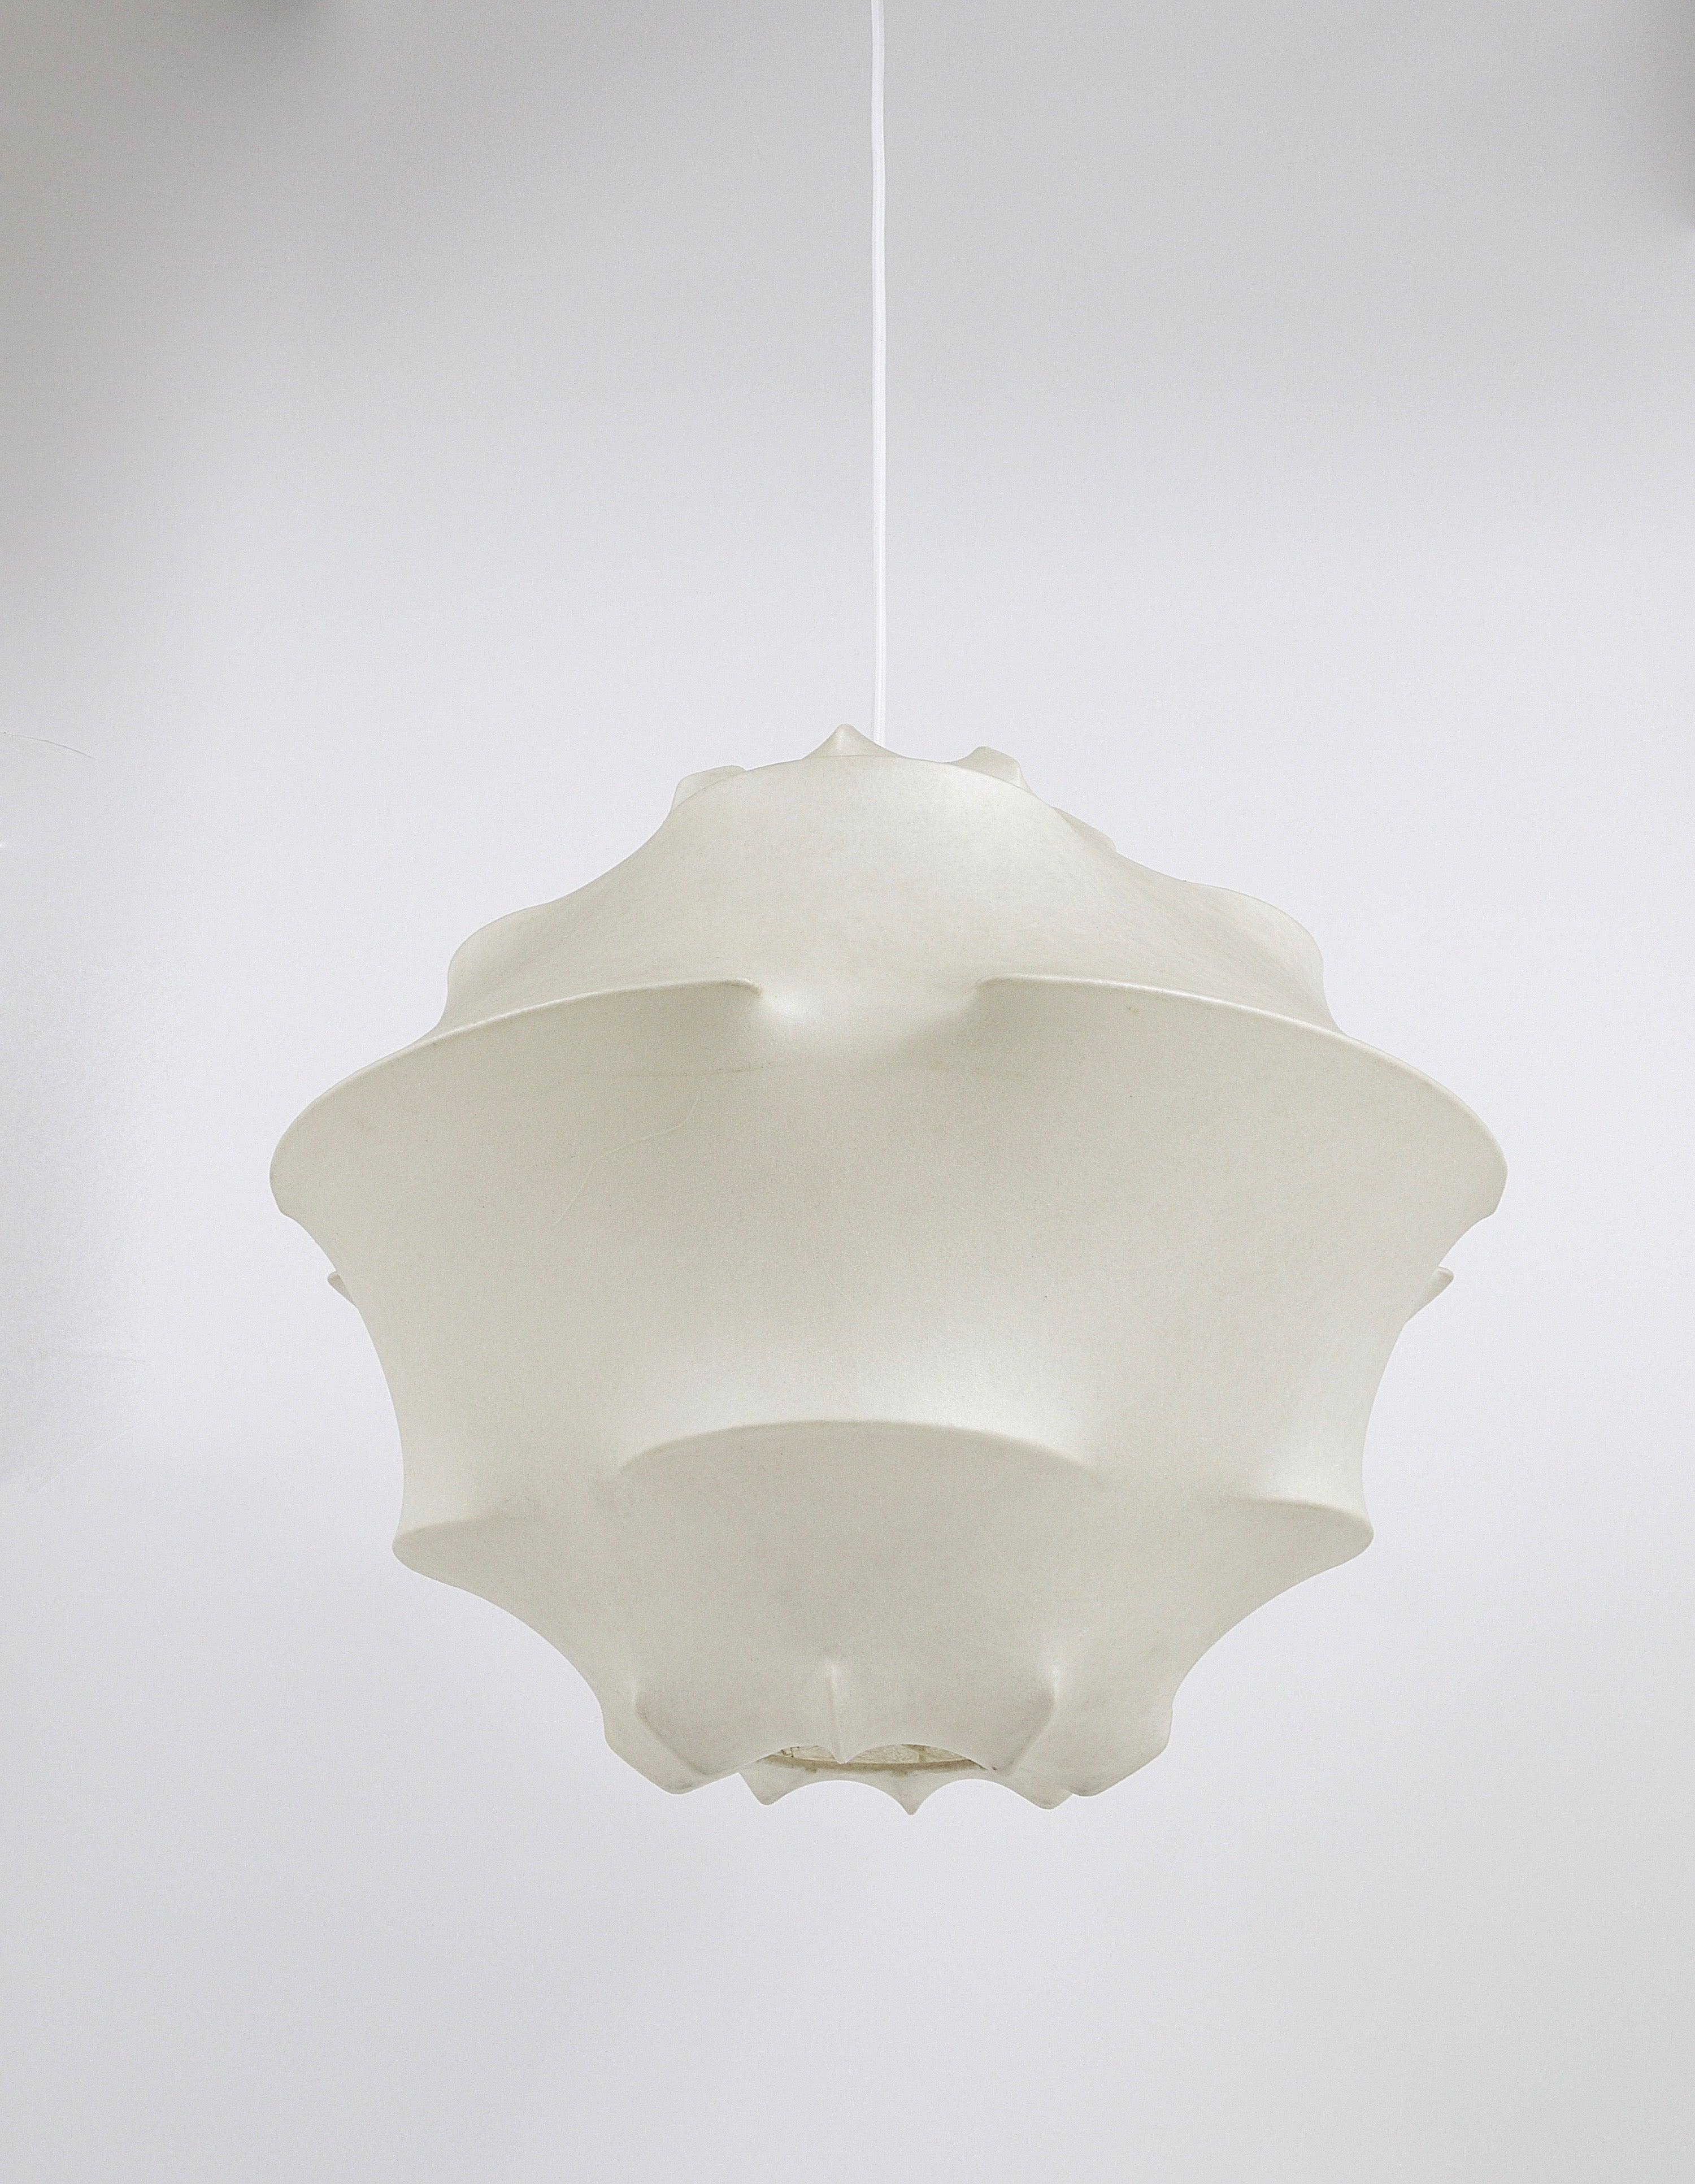 pendant lighting light fragkakis by interior home cloud ceiling ilias portfolio